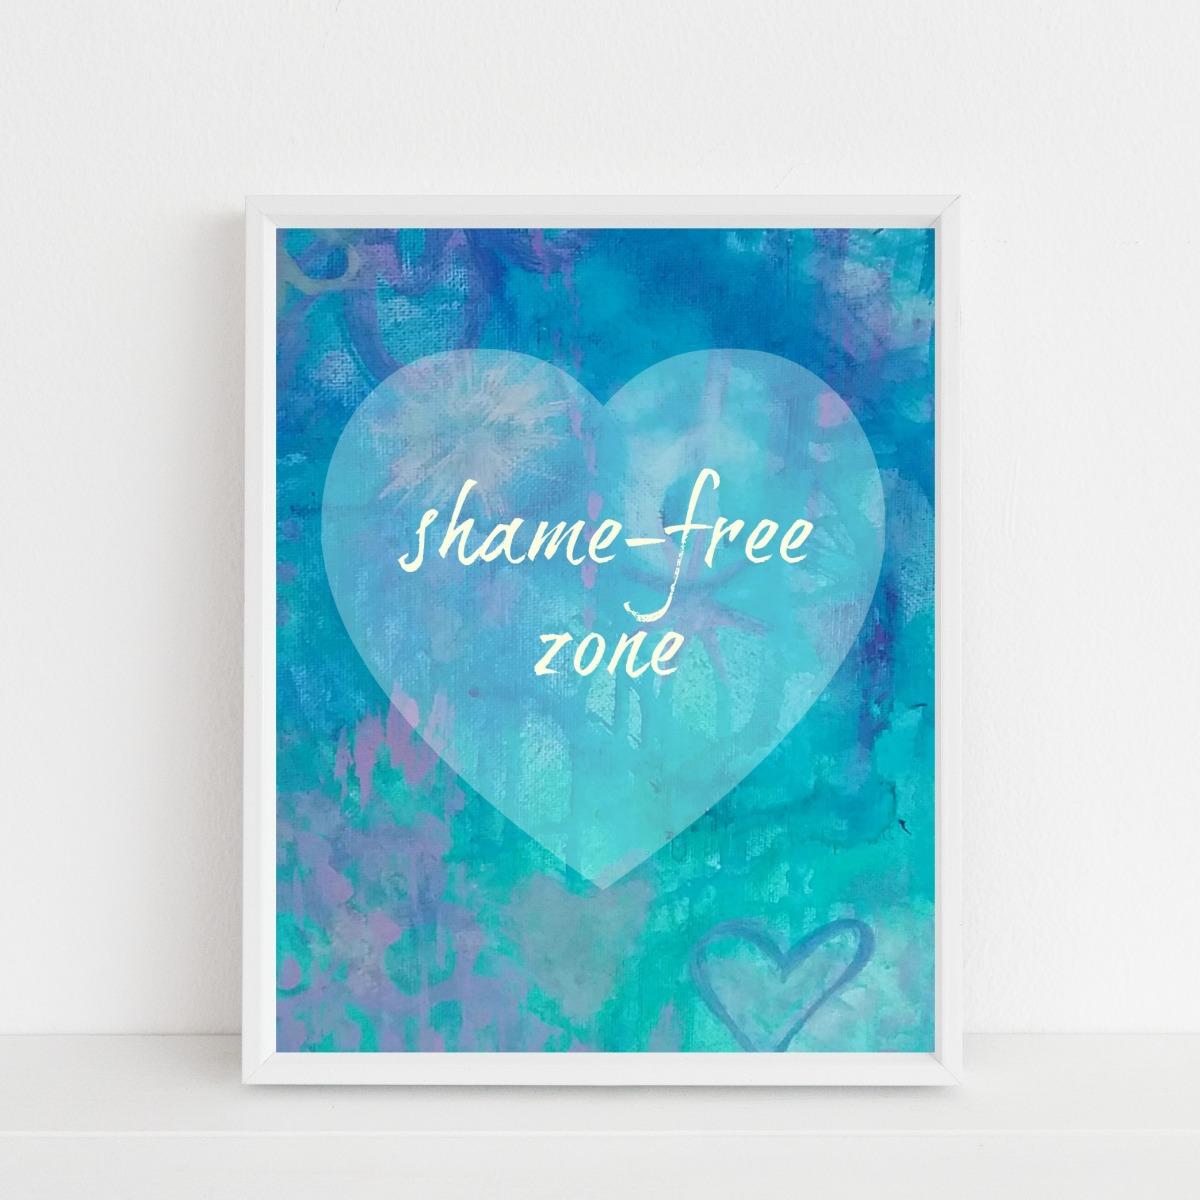 shame-free zone…